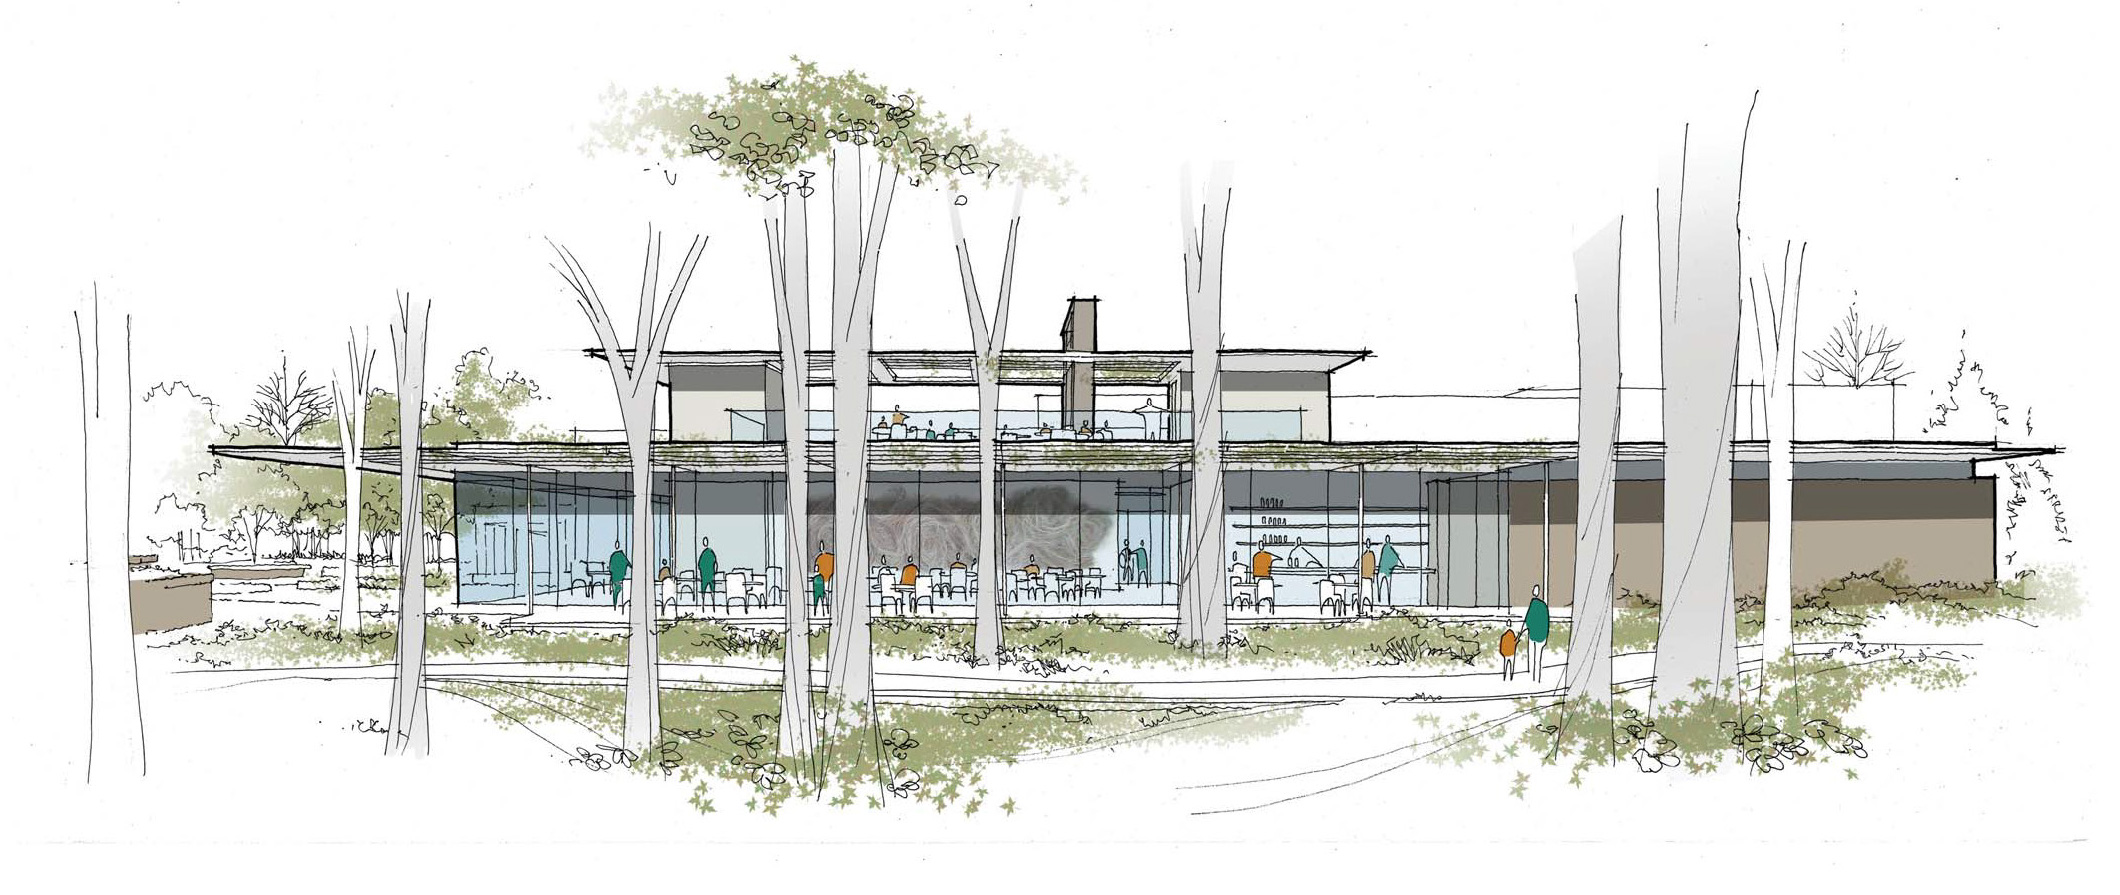 A rendering of Linton's In The Garden.